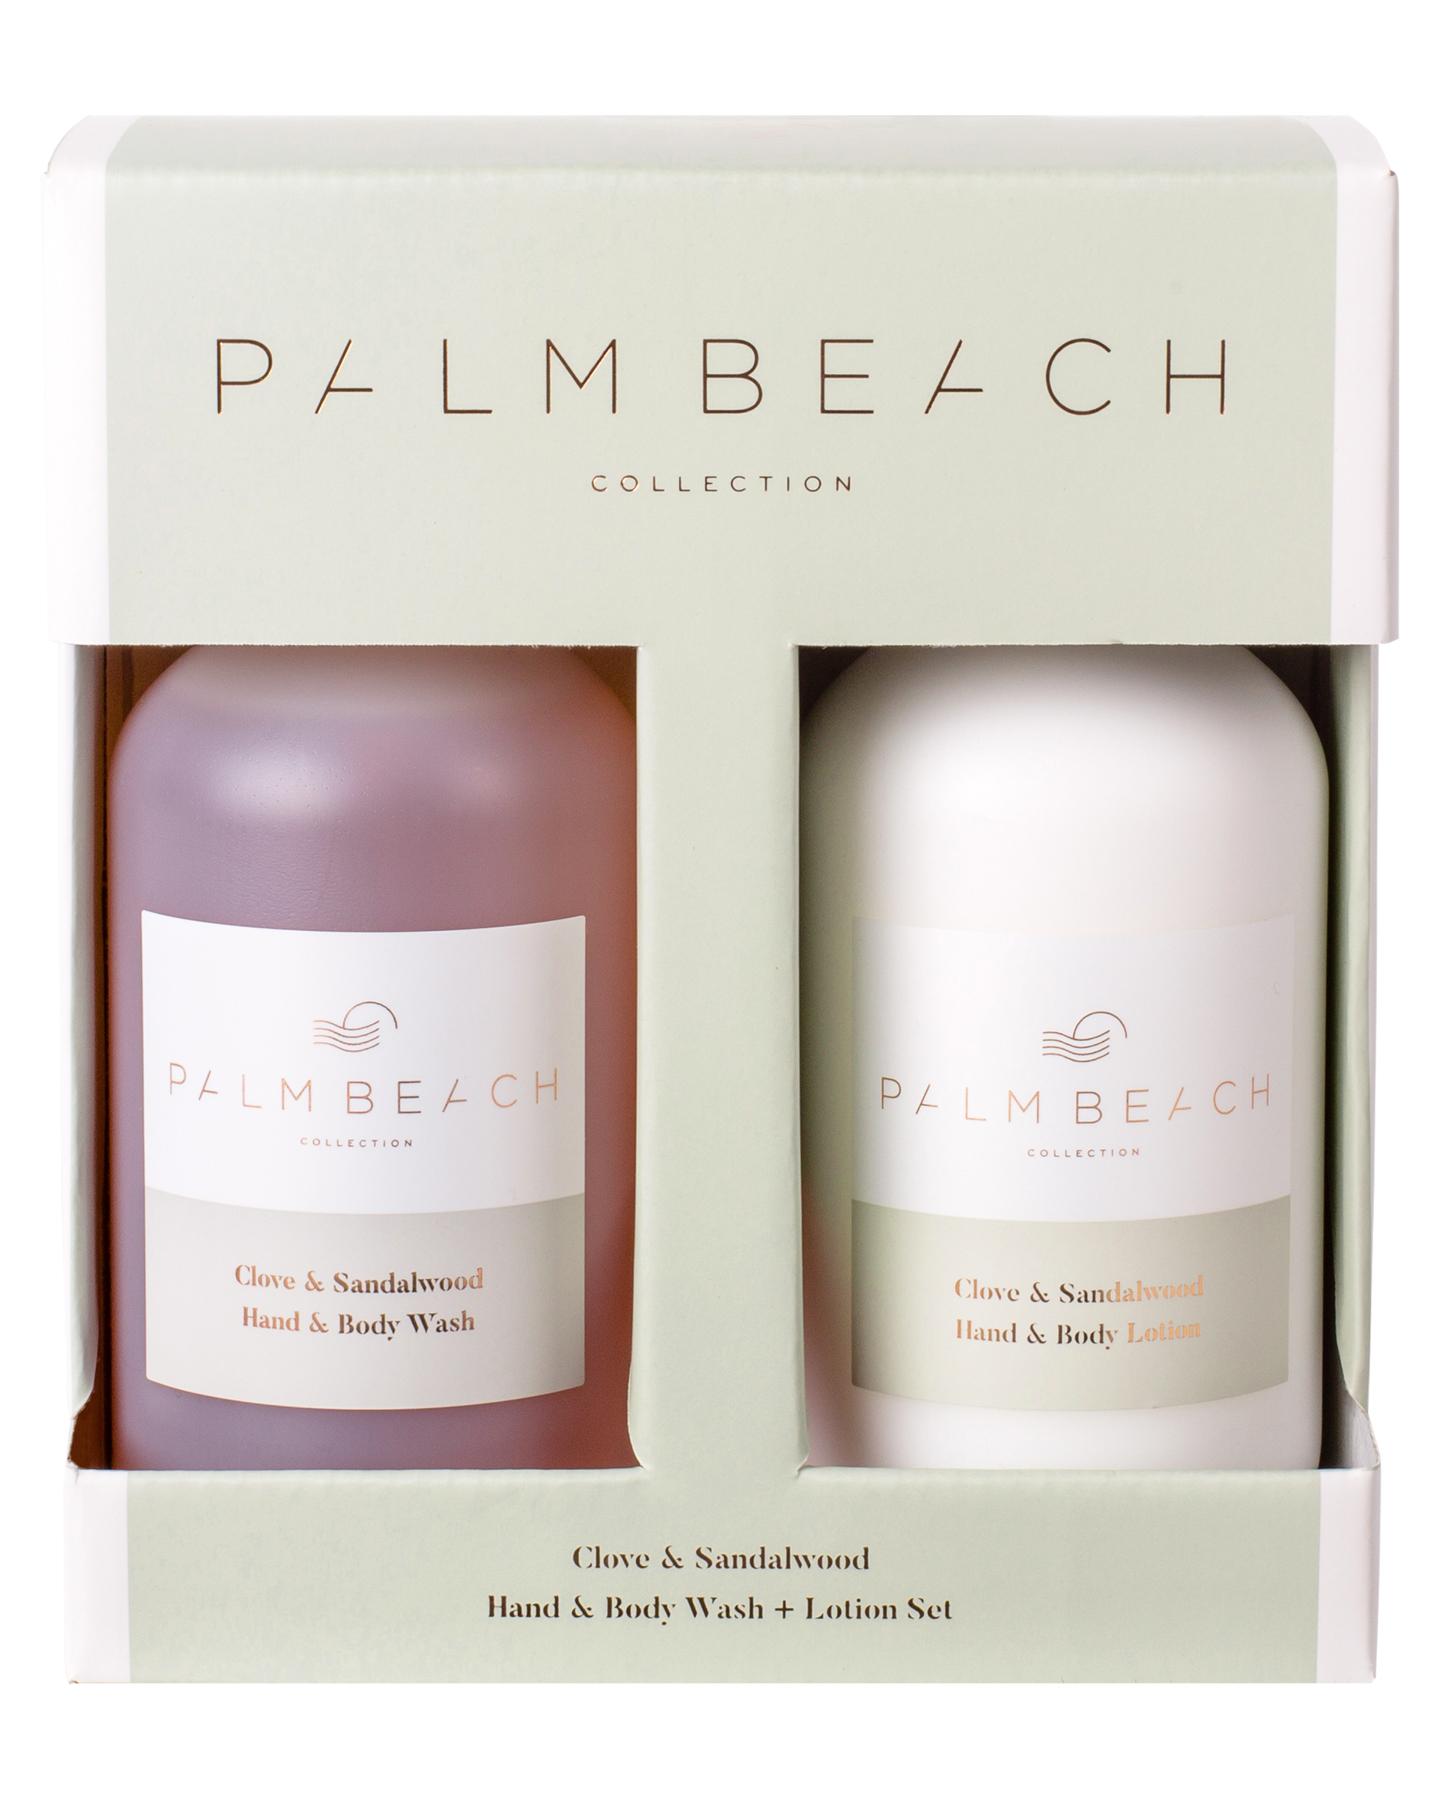 Palm Beach Collection Clove And Sandalwood Hand And Body Gift Pack Clove And Sandalwood Clove And Sandalwood